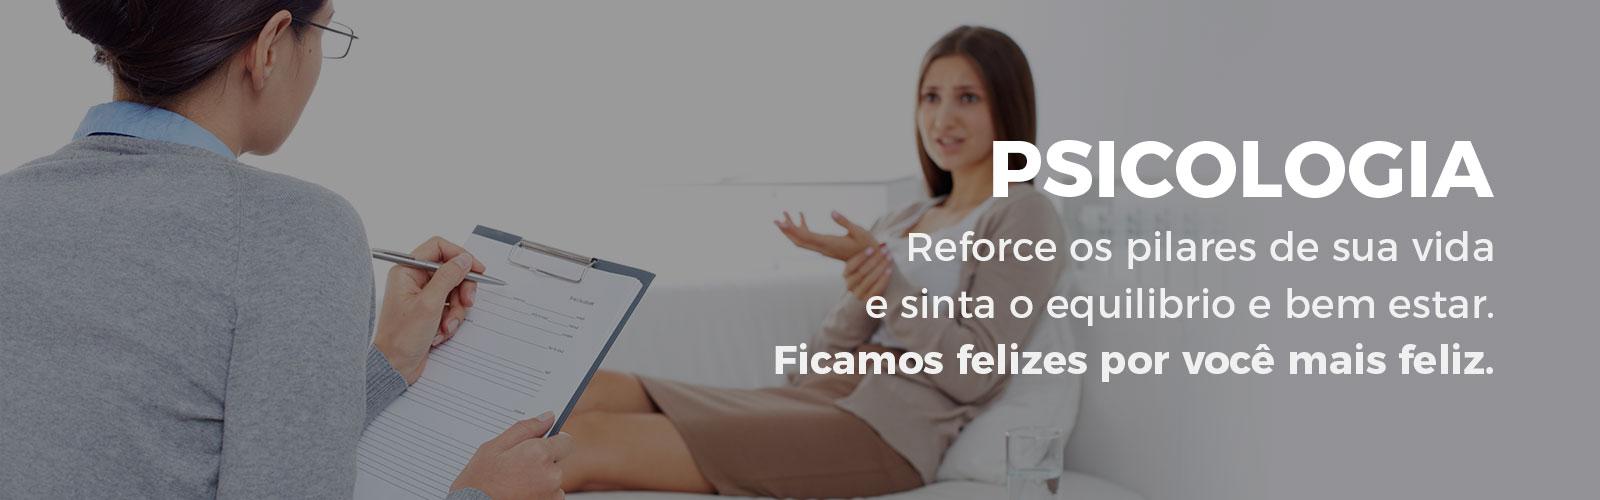 https://belaclin.com.br/psicologia